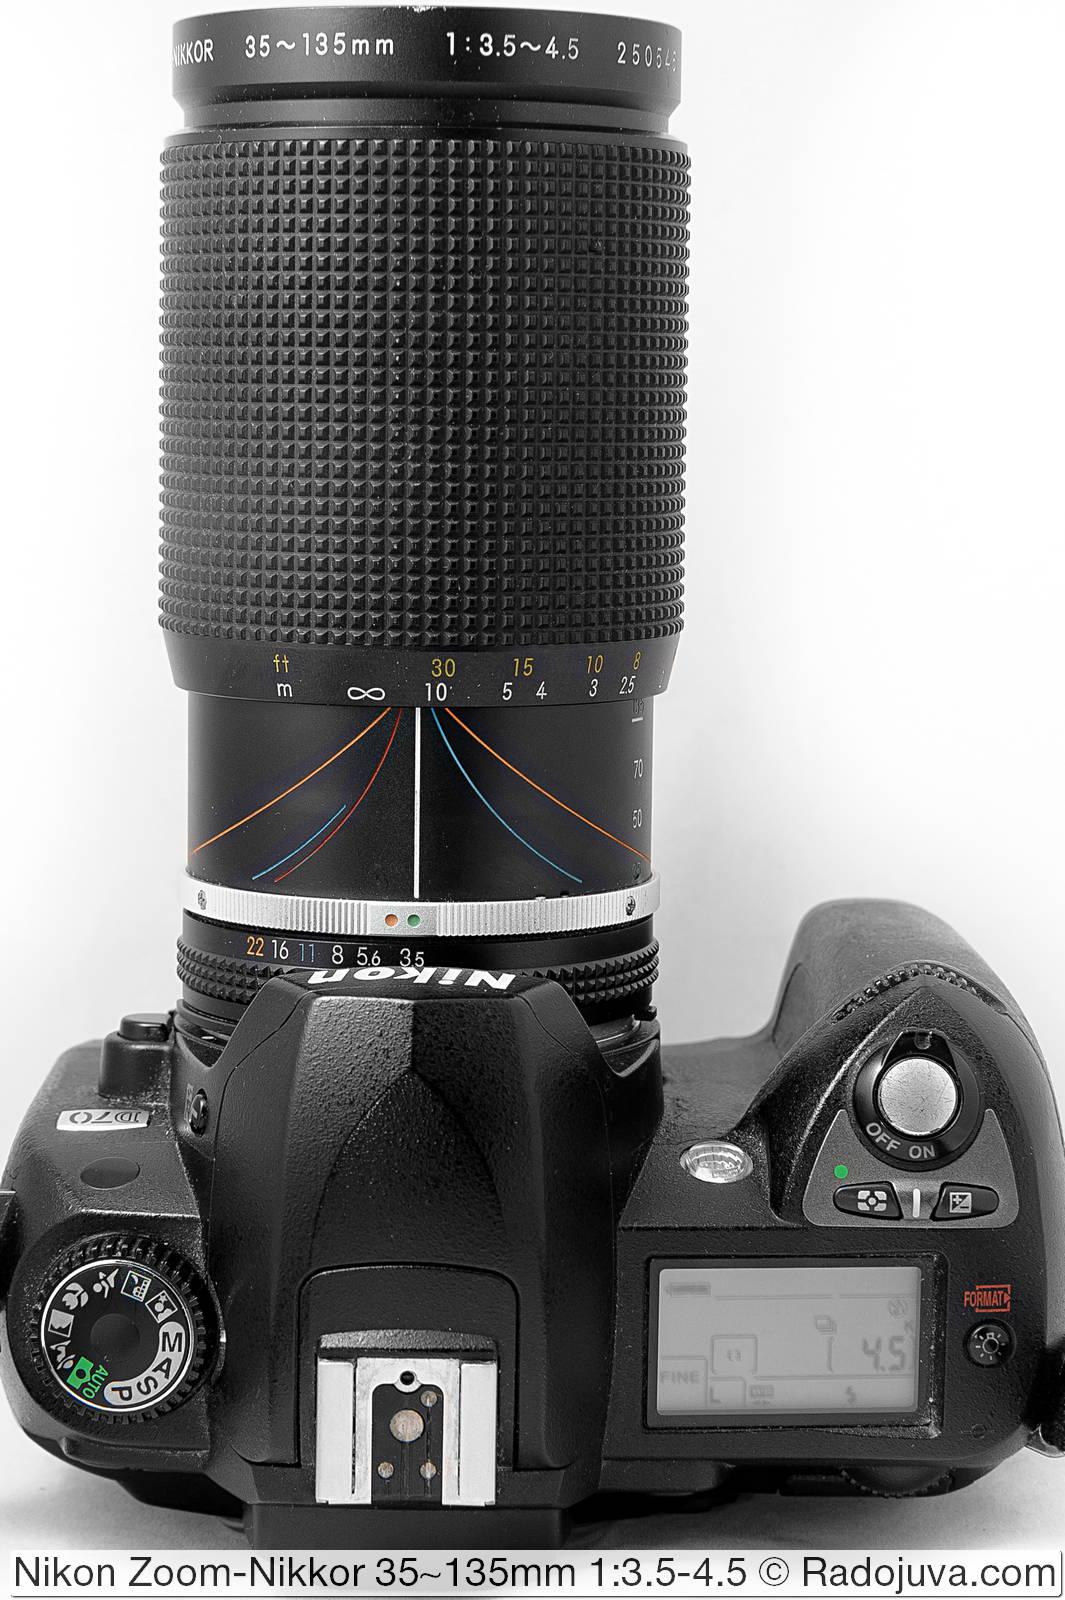 Nikon Zoom-Nikkor 35-135mm 1:3.5-4.5 (AI-S)